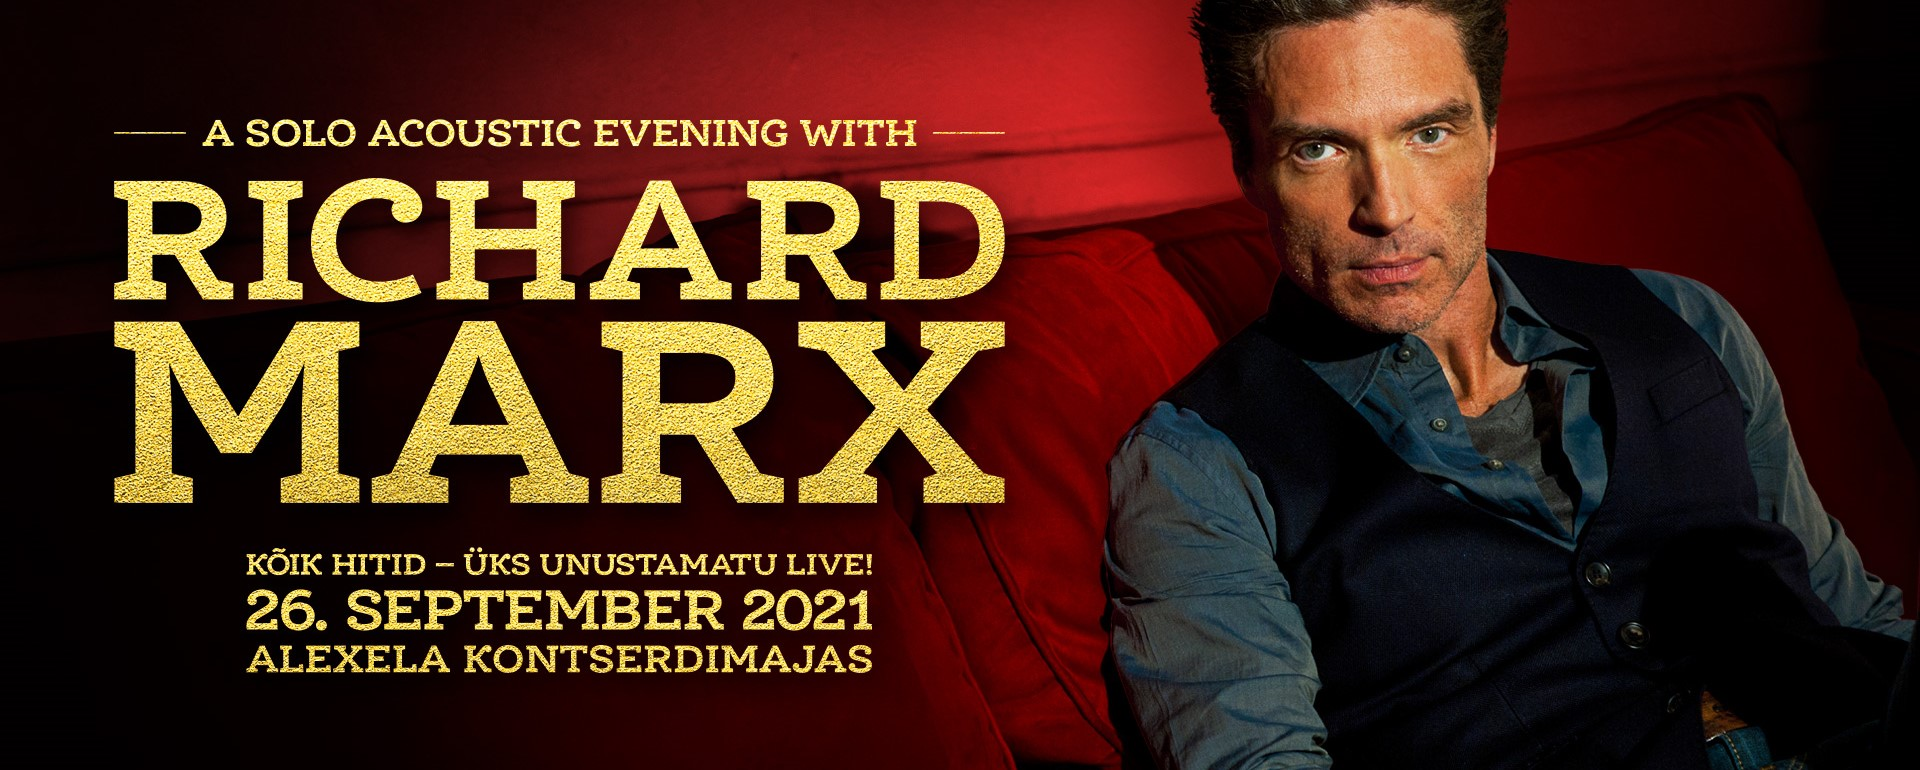 RICHARD MARX – A Solo Acoustic Evening